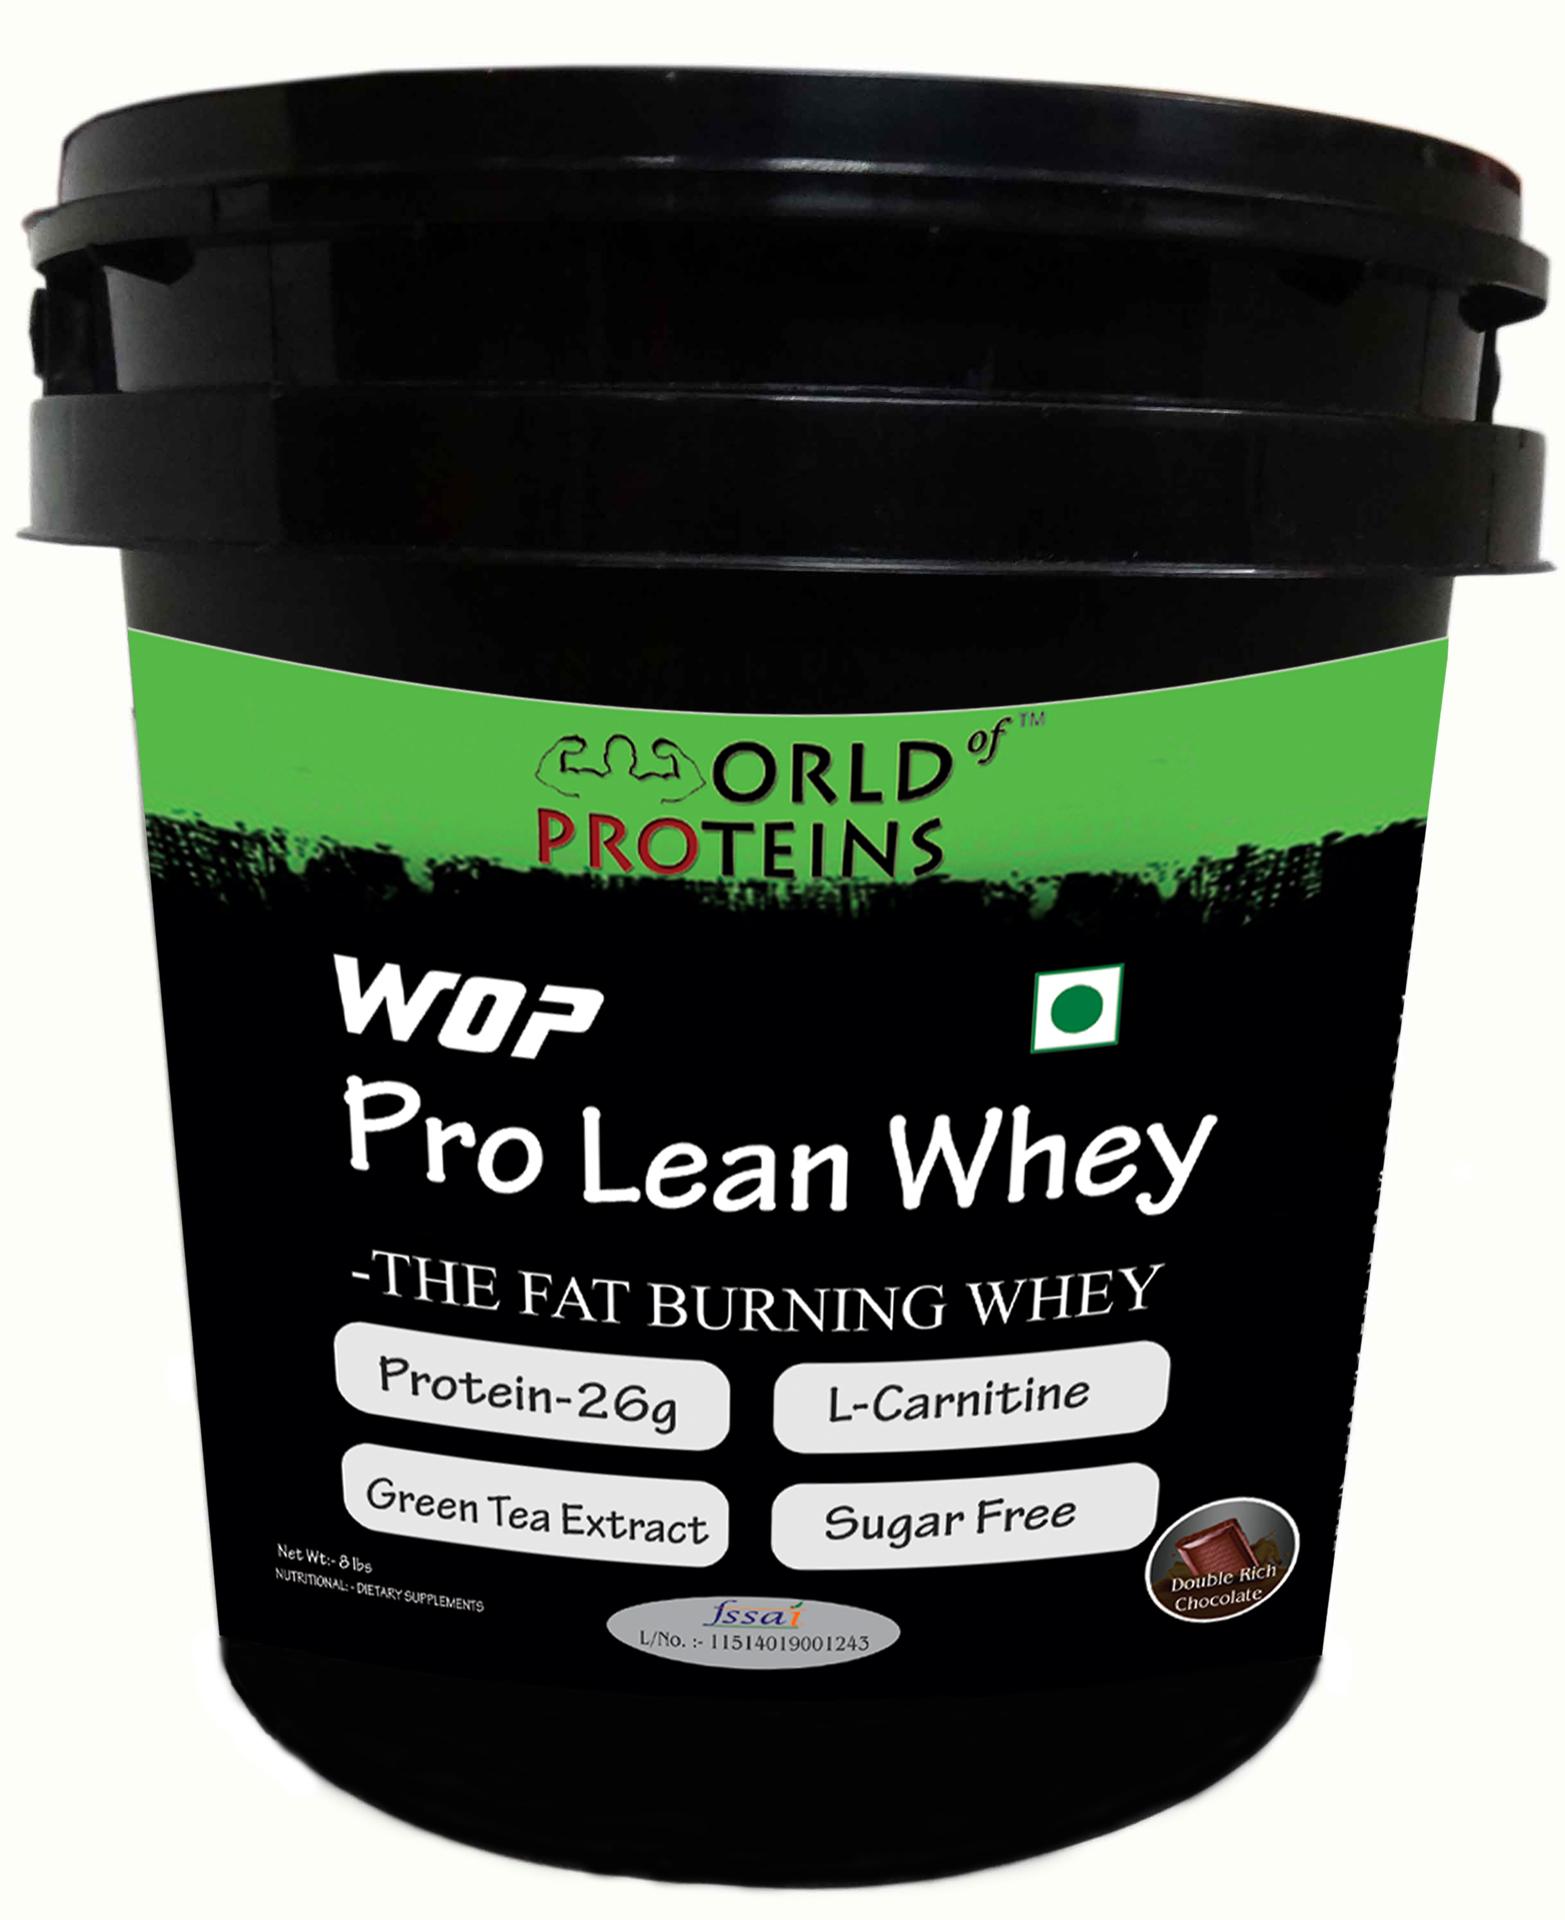 WOP PRO LEAN WHEY,8-lb double-rich-chocolate ,Shaker Free!